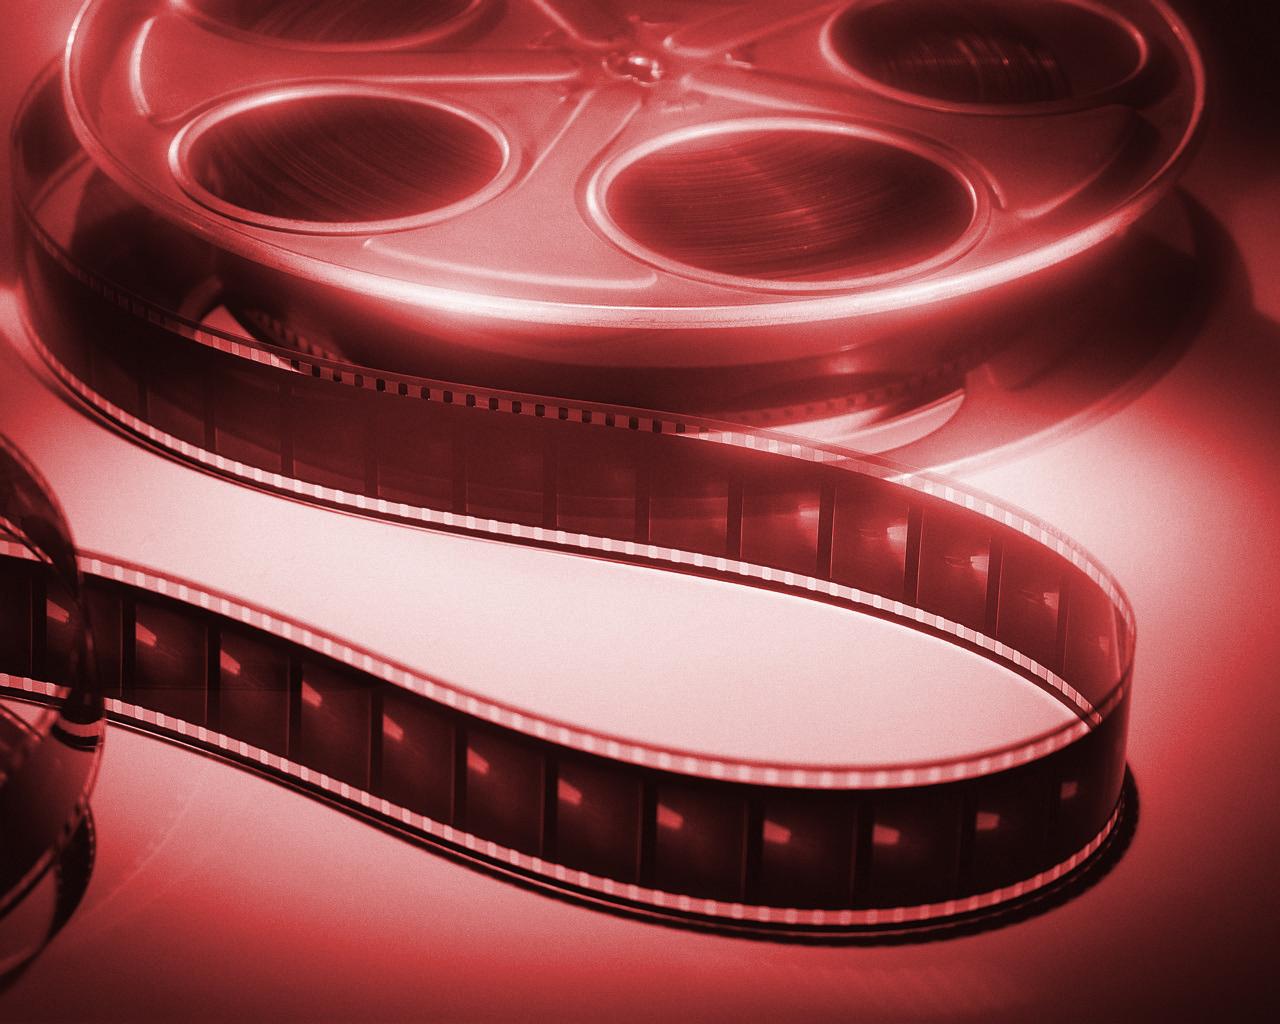 quintessential leaders see people as movies while unquintessential quintessential leaders see people as movies